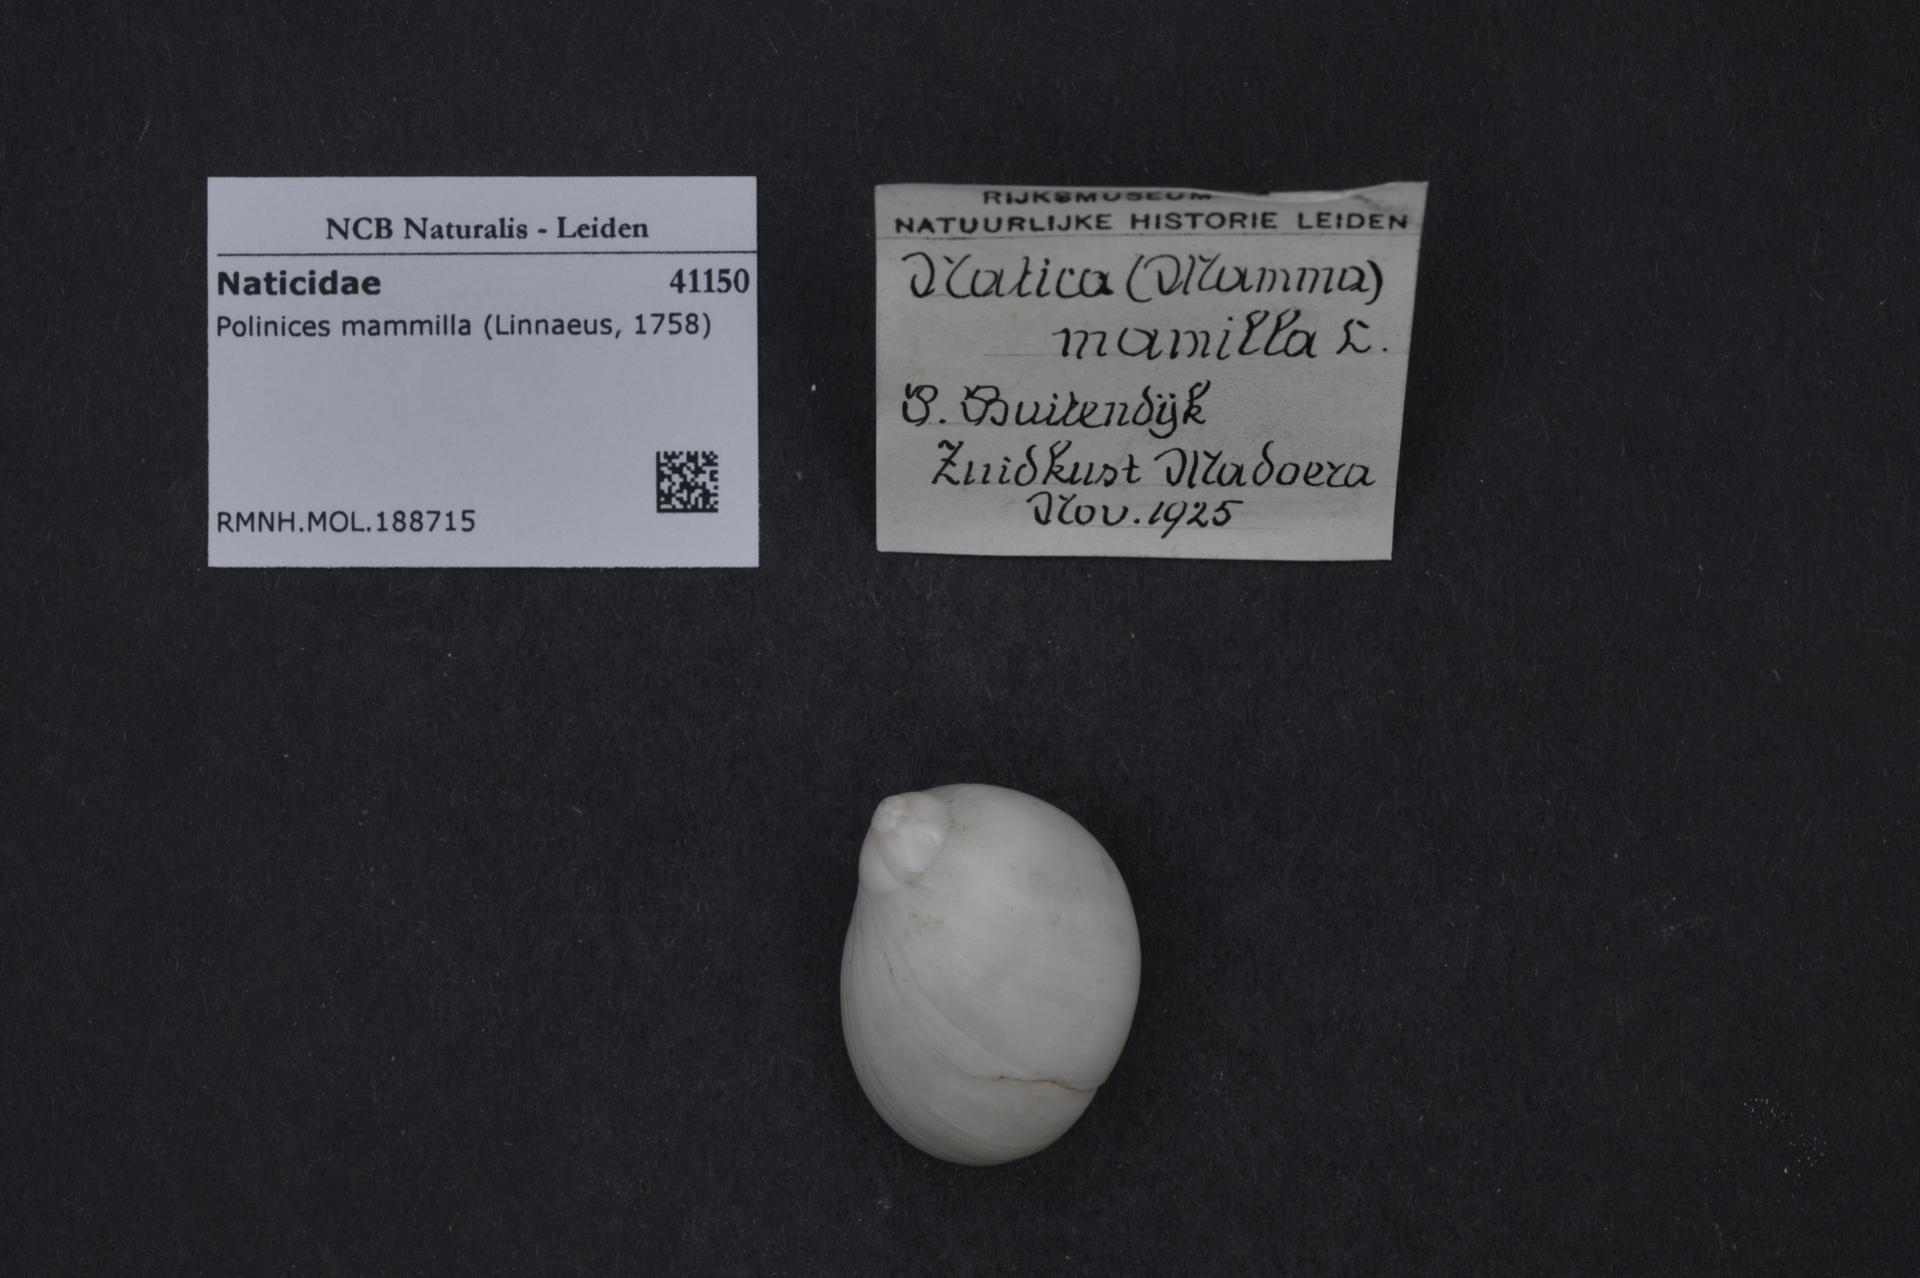 RMNH.MOL.188715 | Polinices mammilla (Linnaeus, 1758)